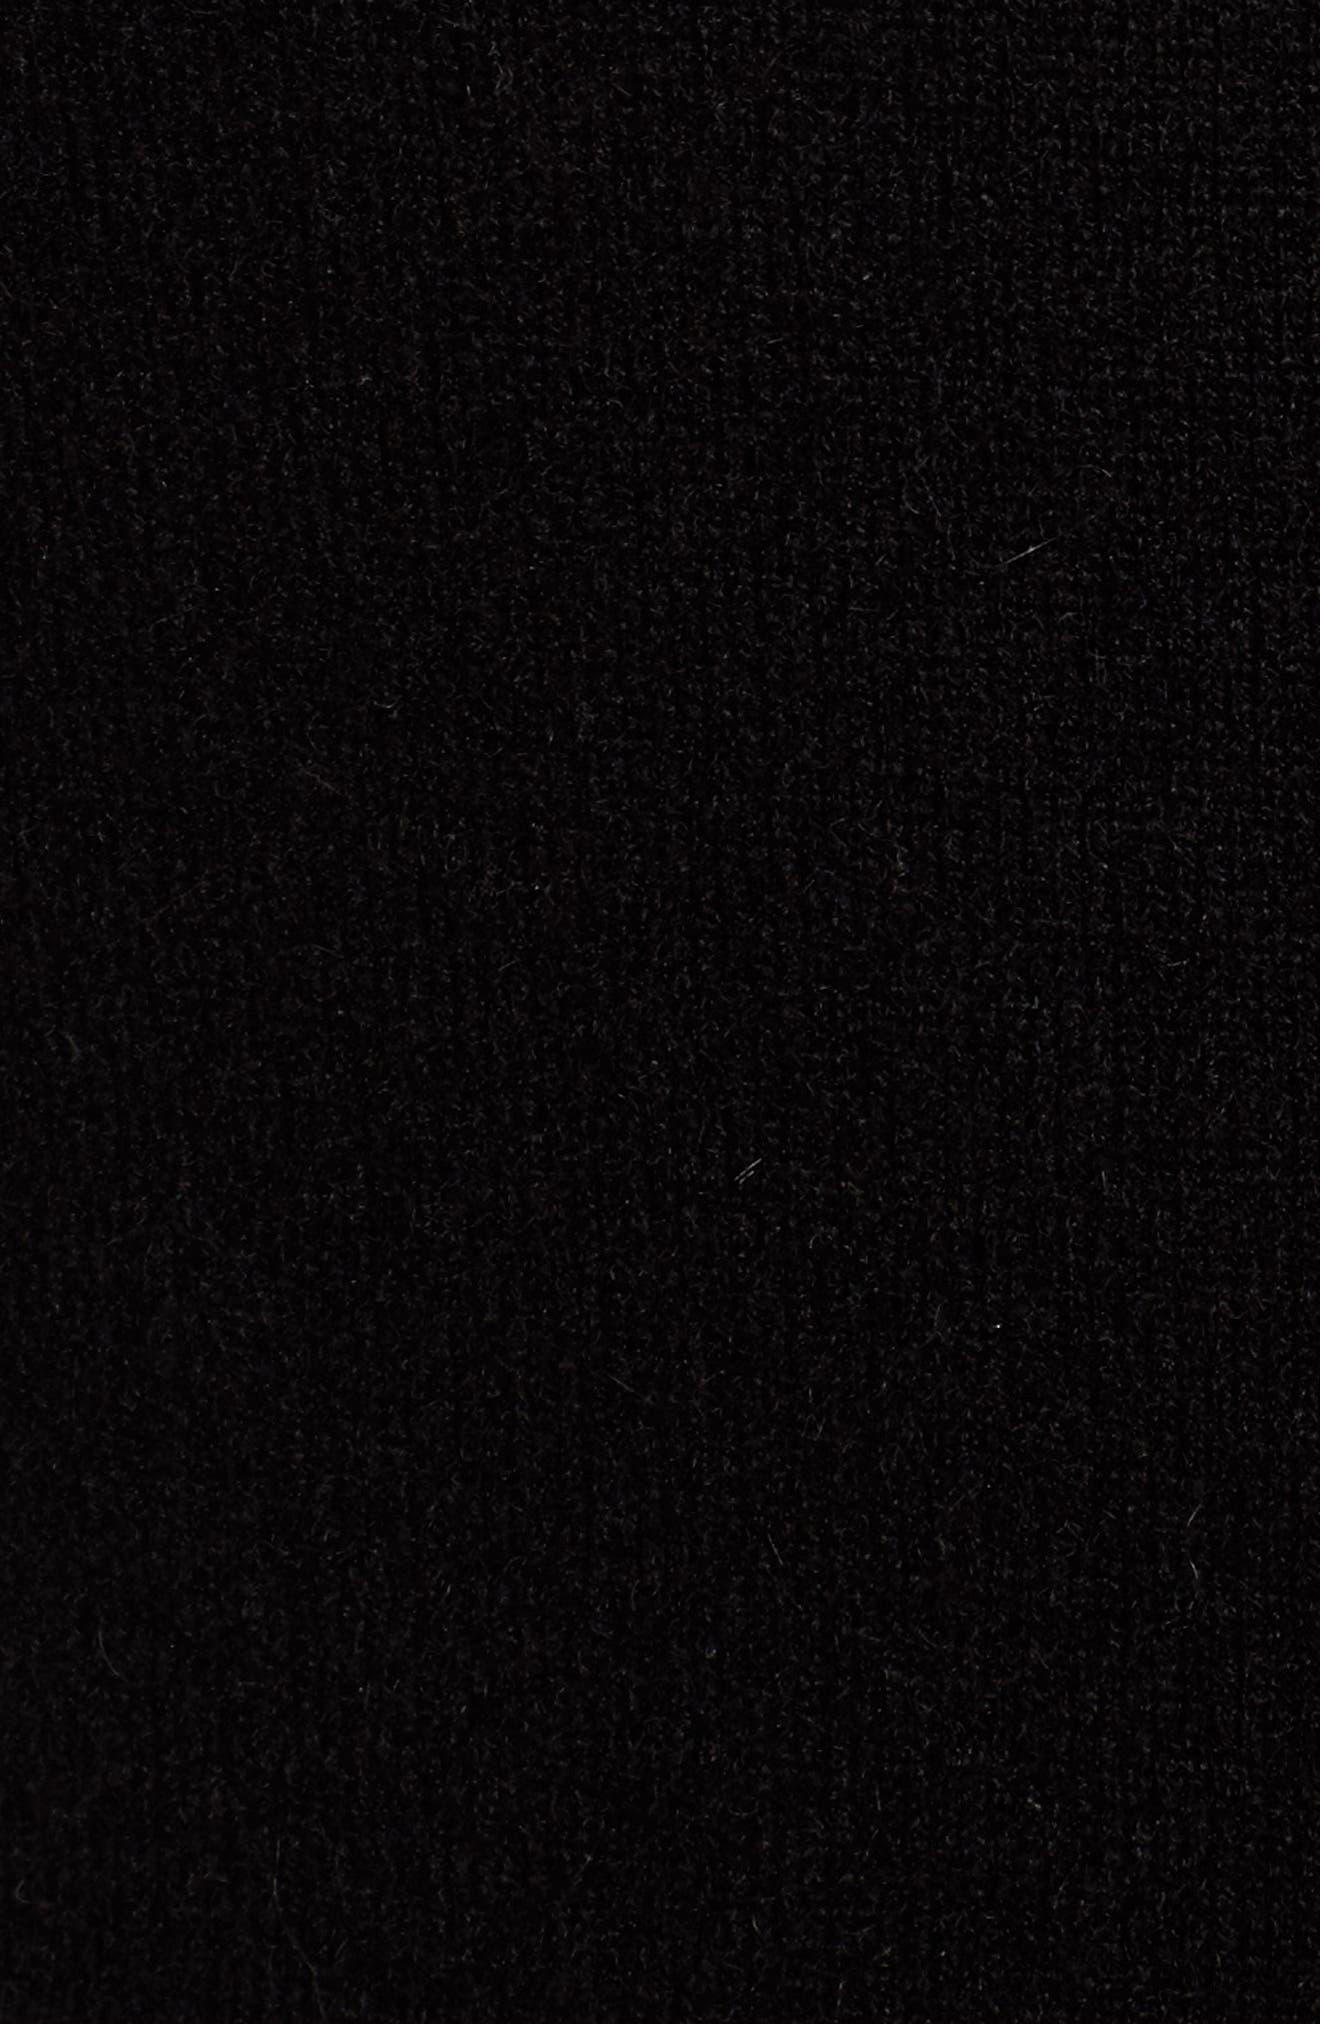 Cashmere Blend V-Neck Midi Dress,                             Alternate thumbnail 5, color,                             001